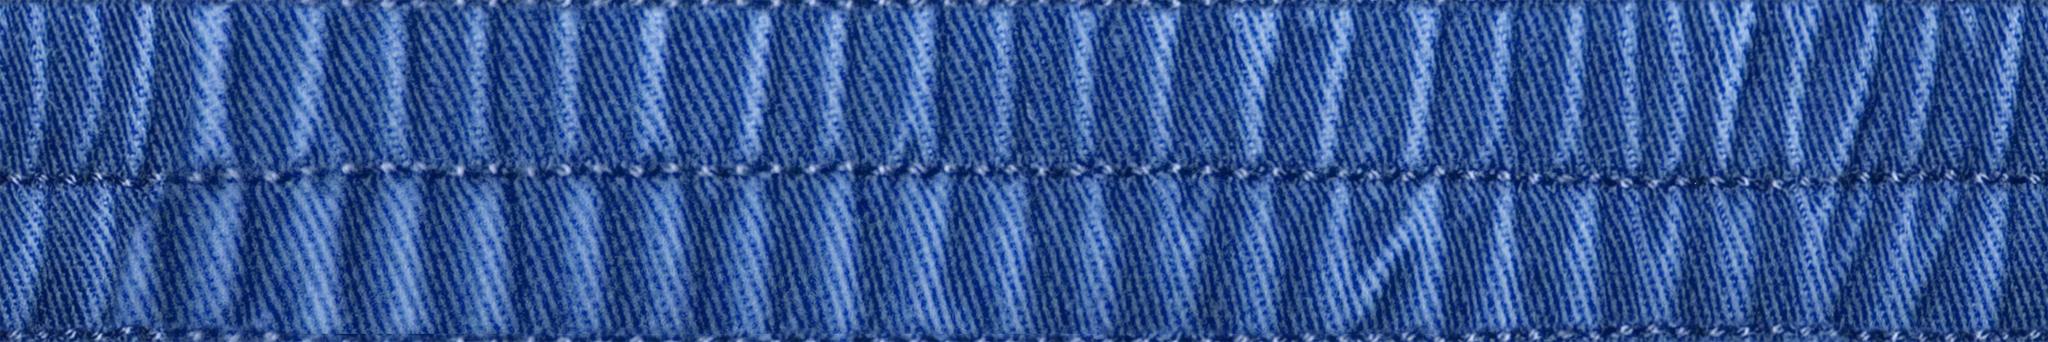 Blue Gathered Edge.jpg